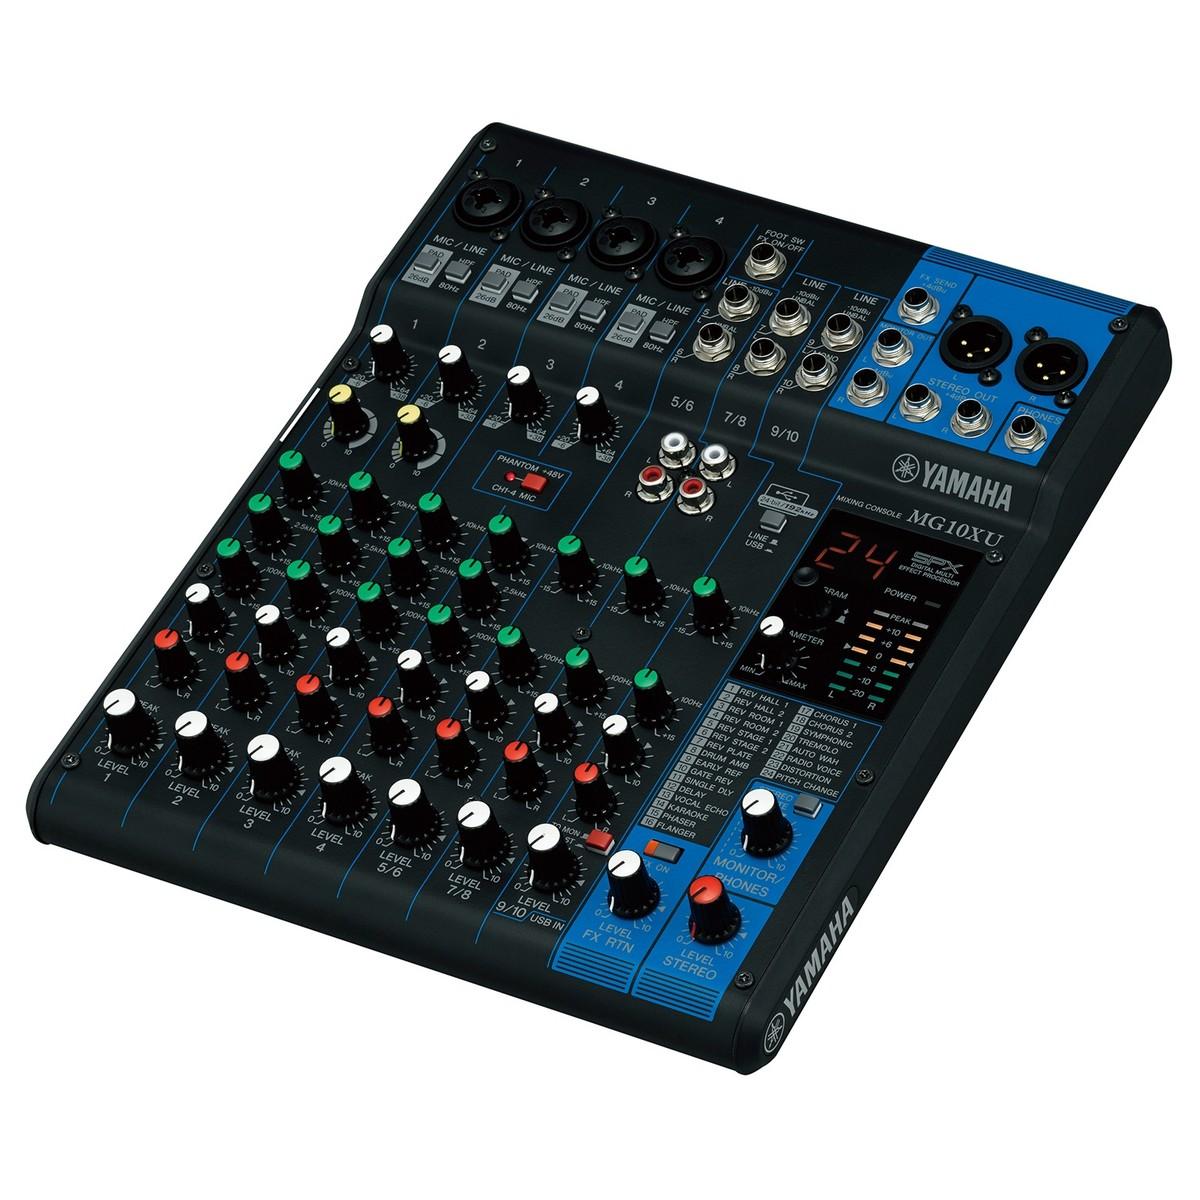 Yamaha MG10XU Analog USB Mixer